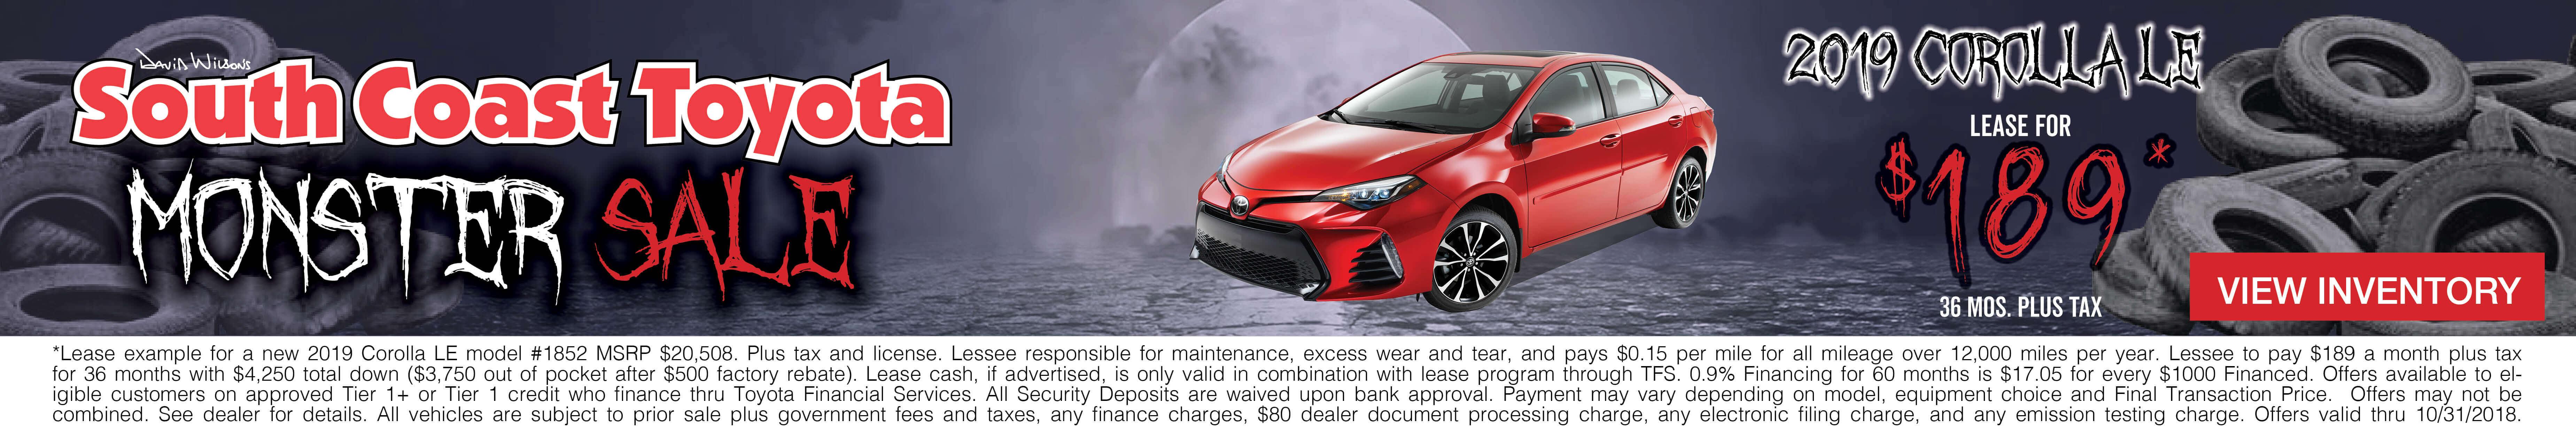 Toyota Corolla $189 Lease